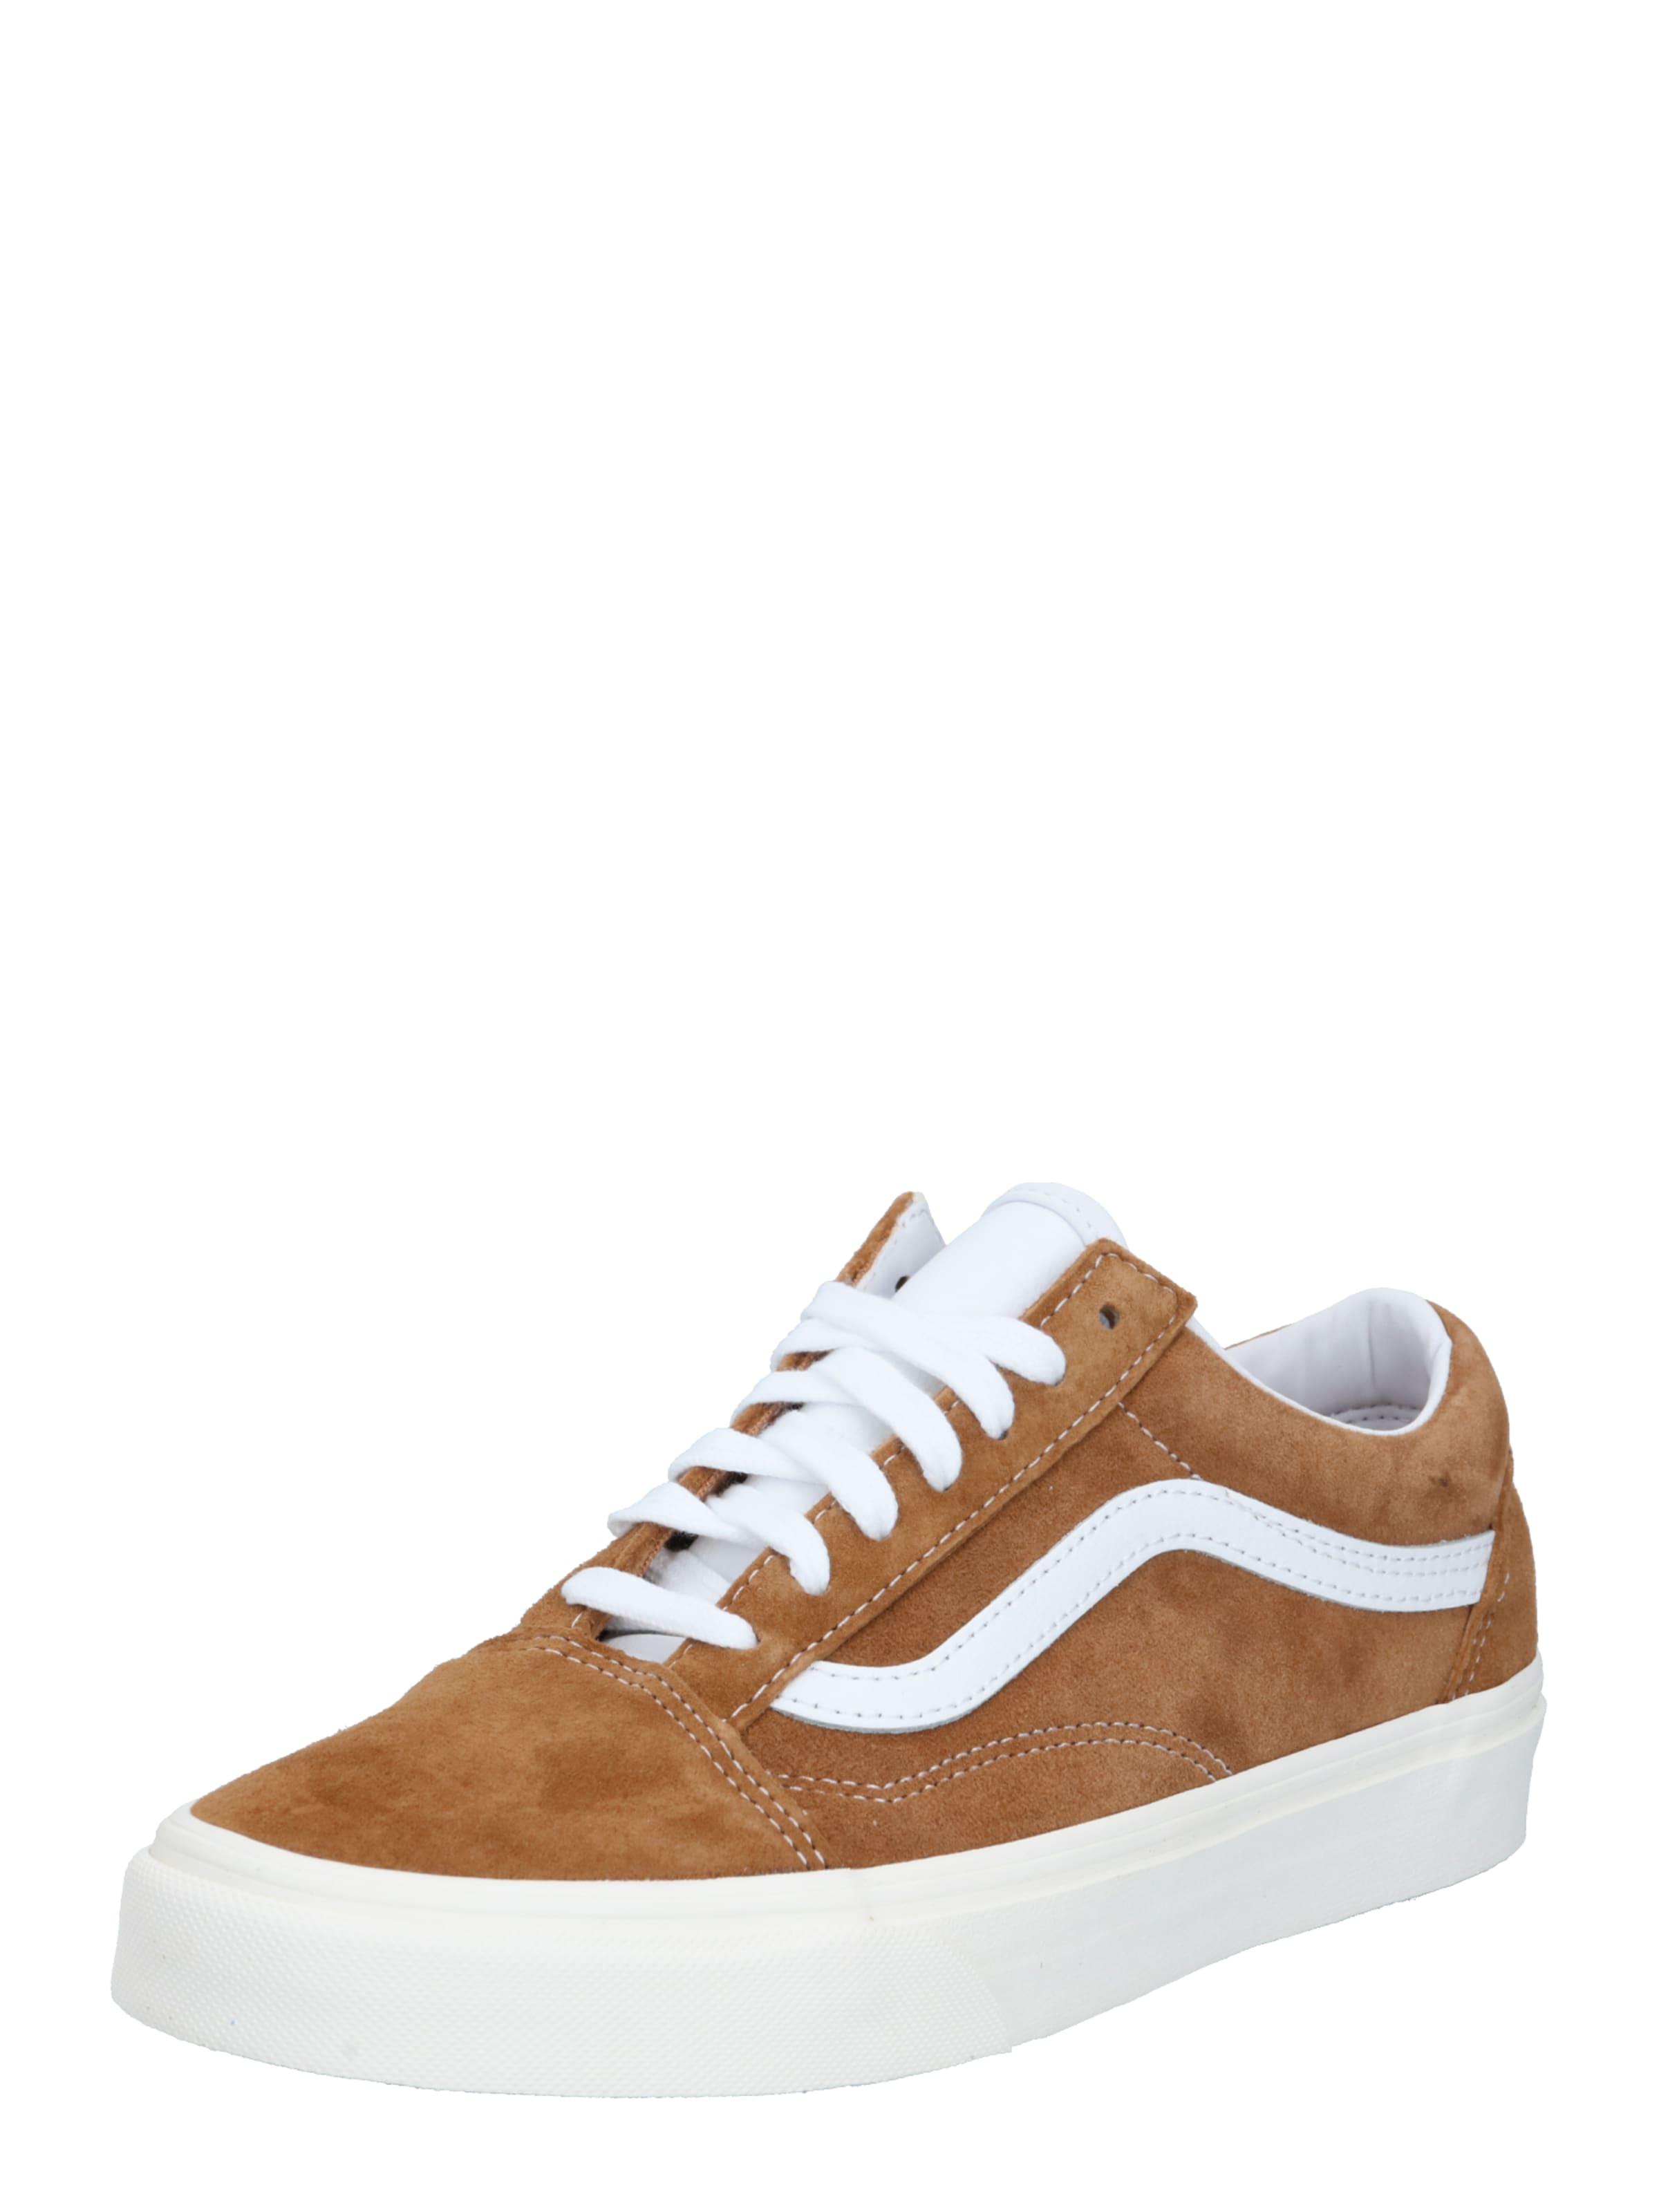 VANS Låg sneaker 'Old Skool' i brun / vit